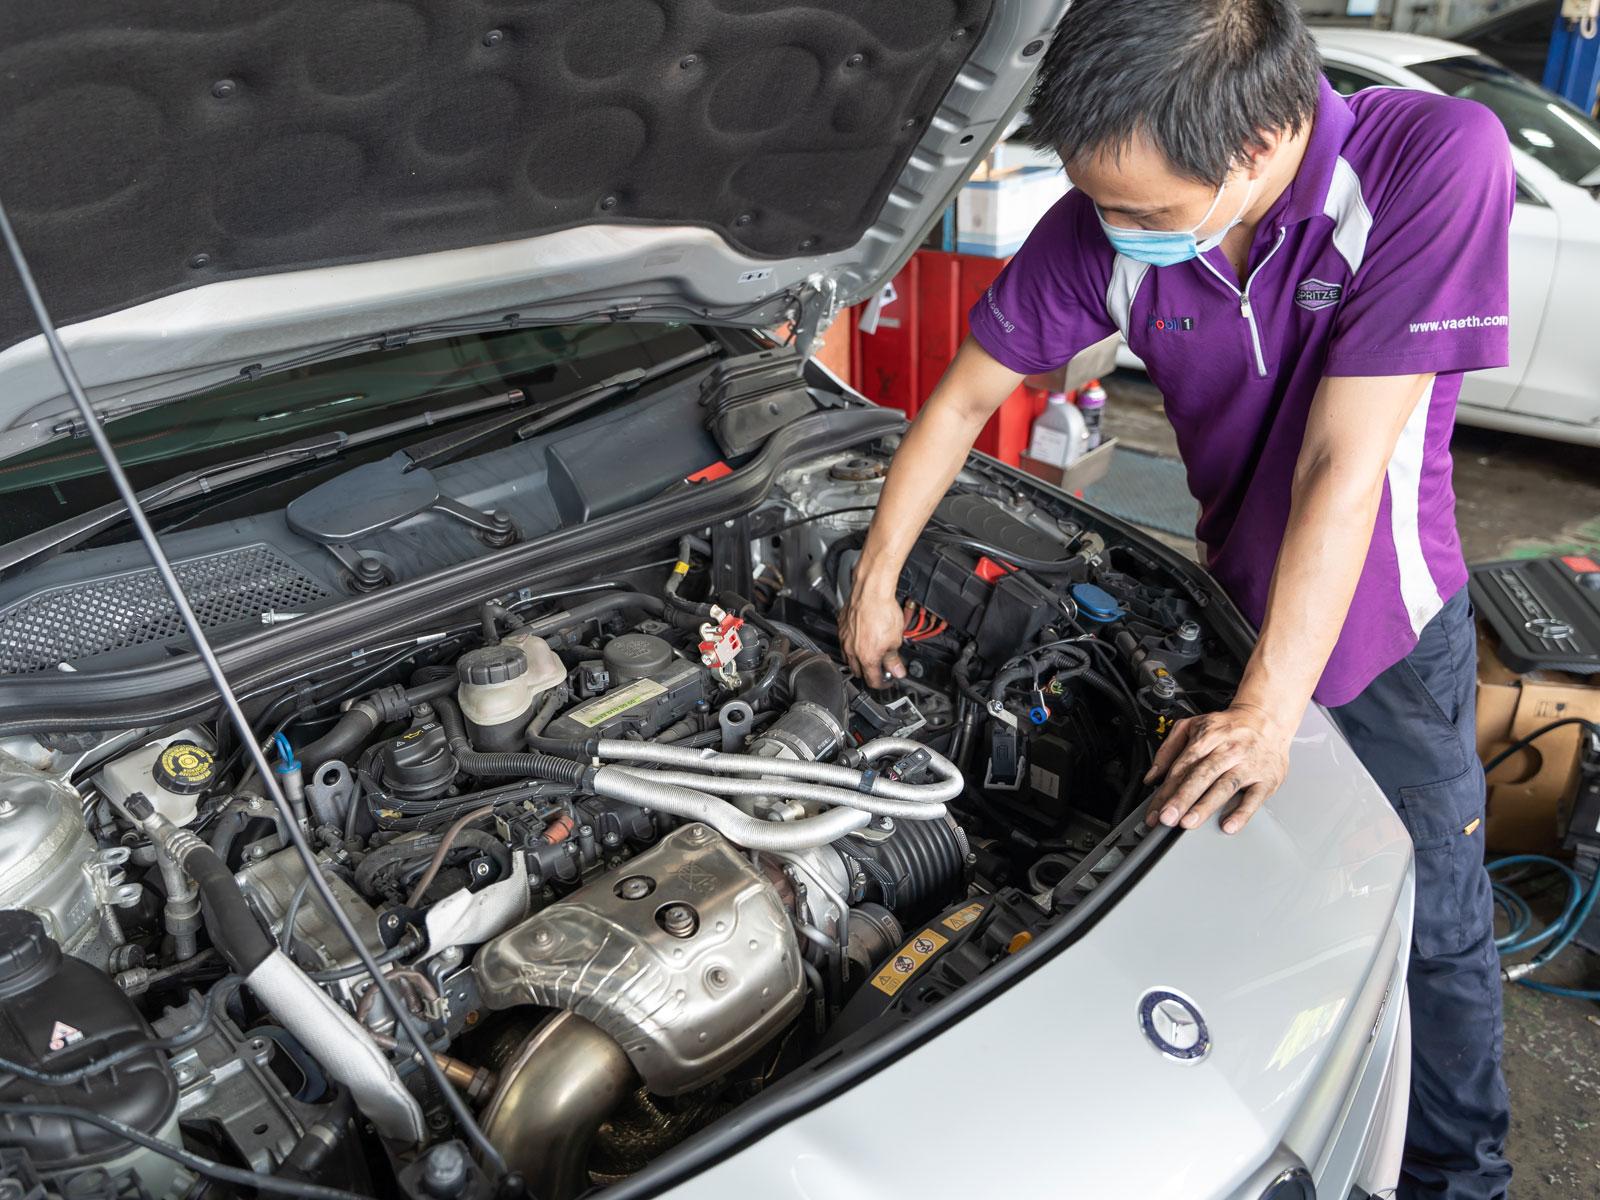 Shell Helix Ultra 5W40 Japanese Car Make Vehicle Servicing